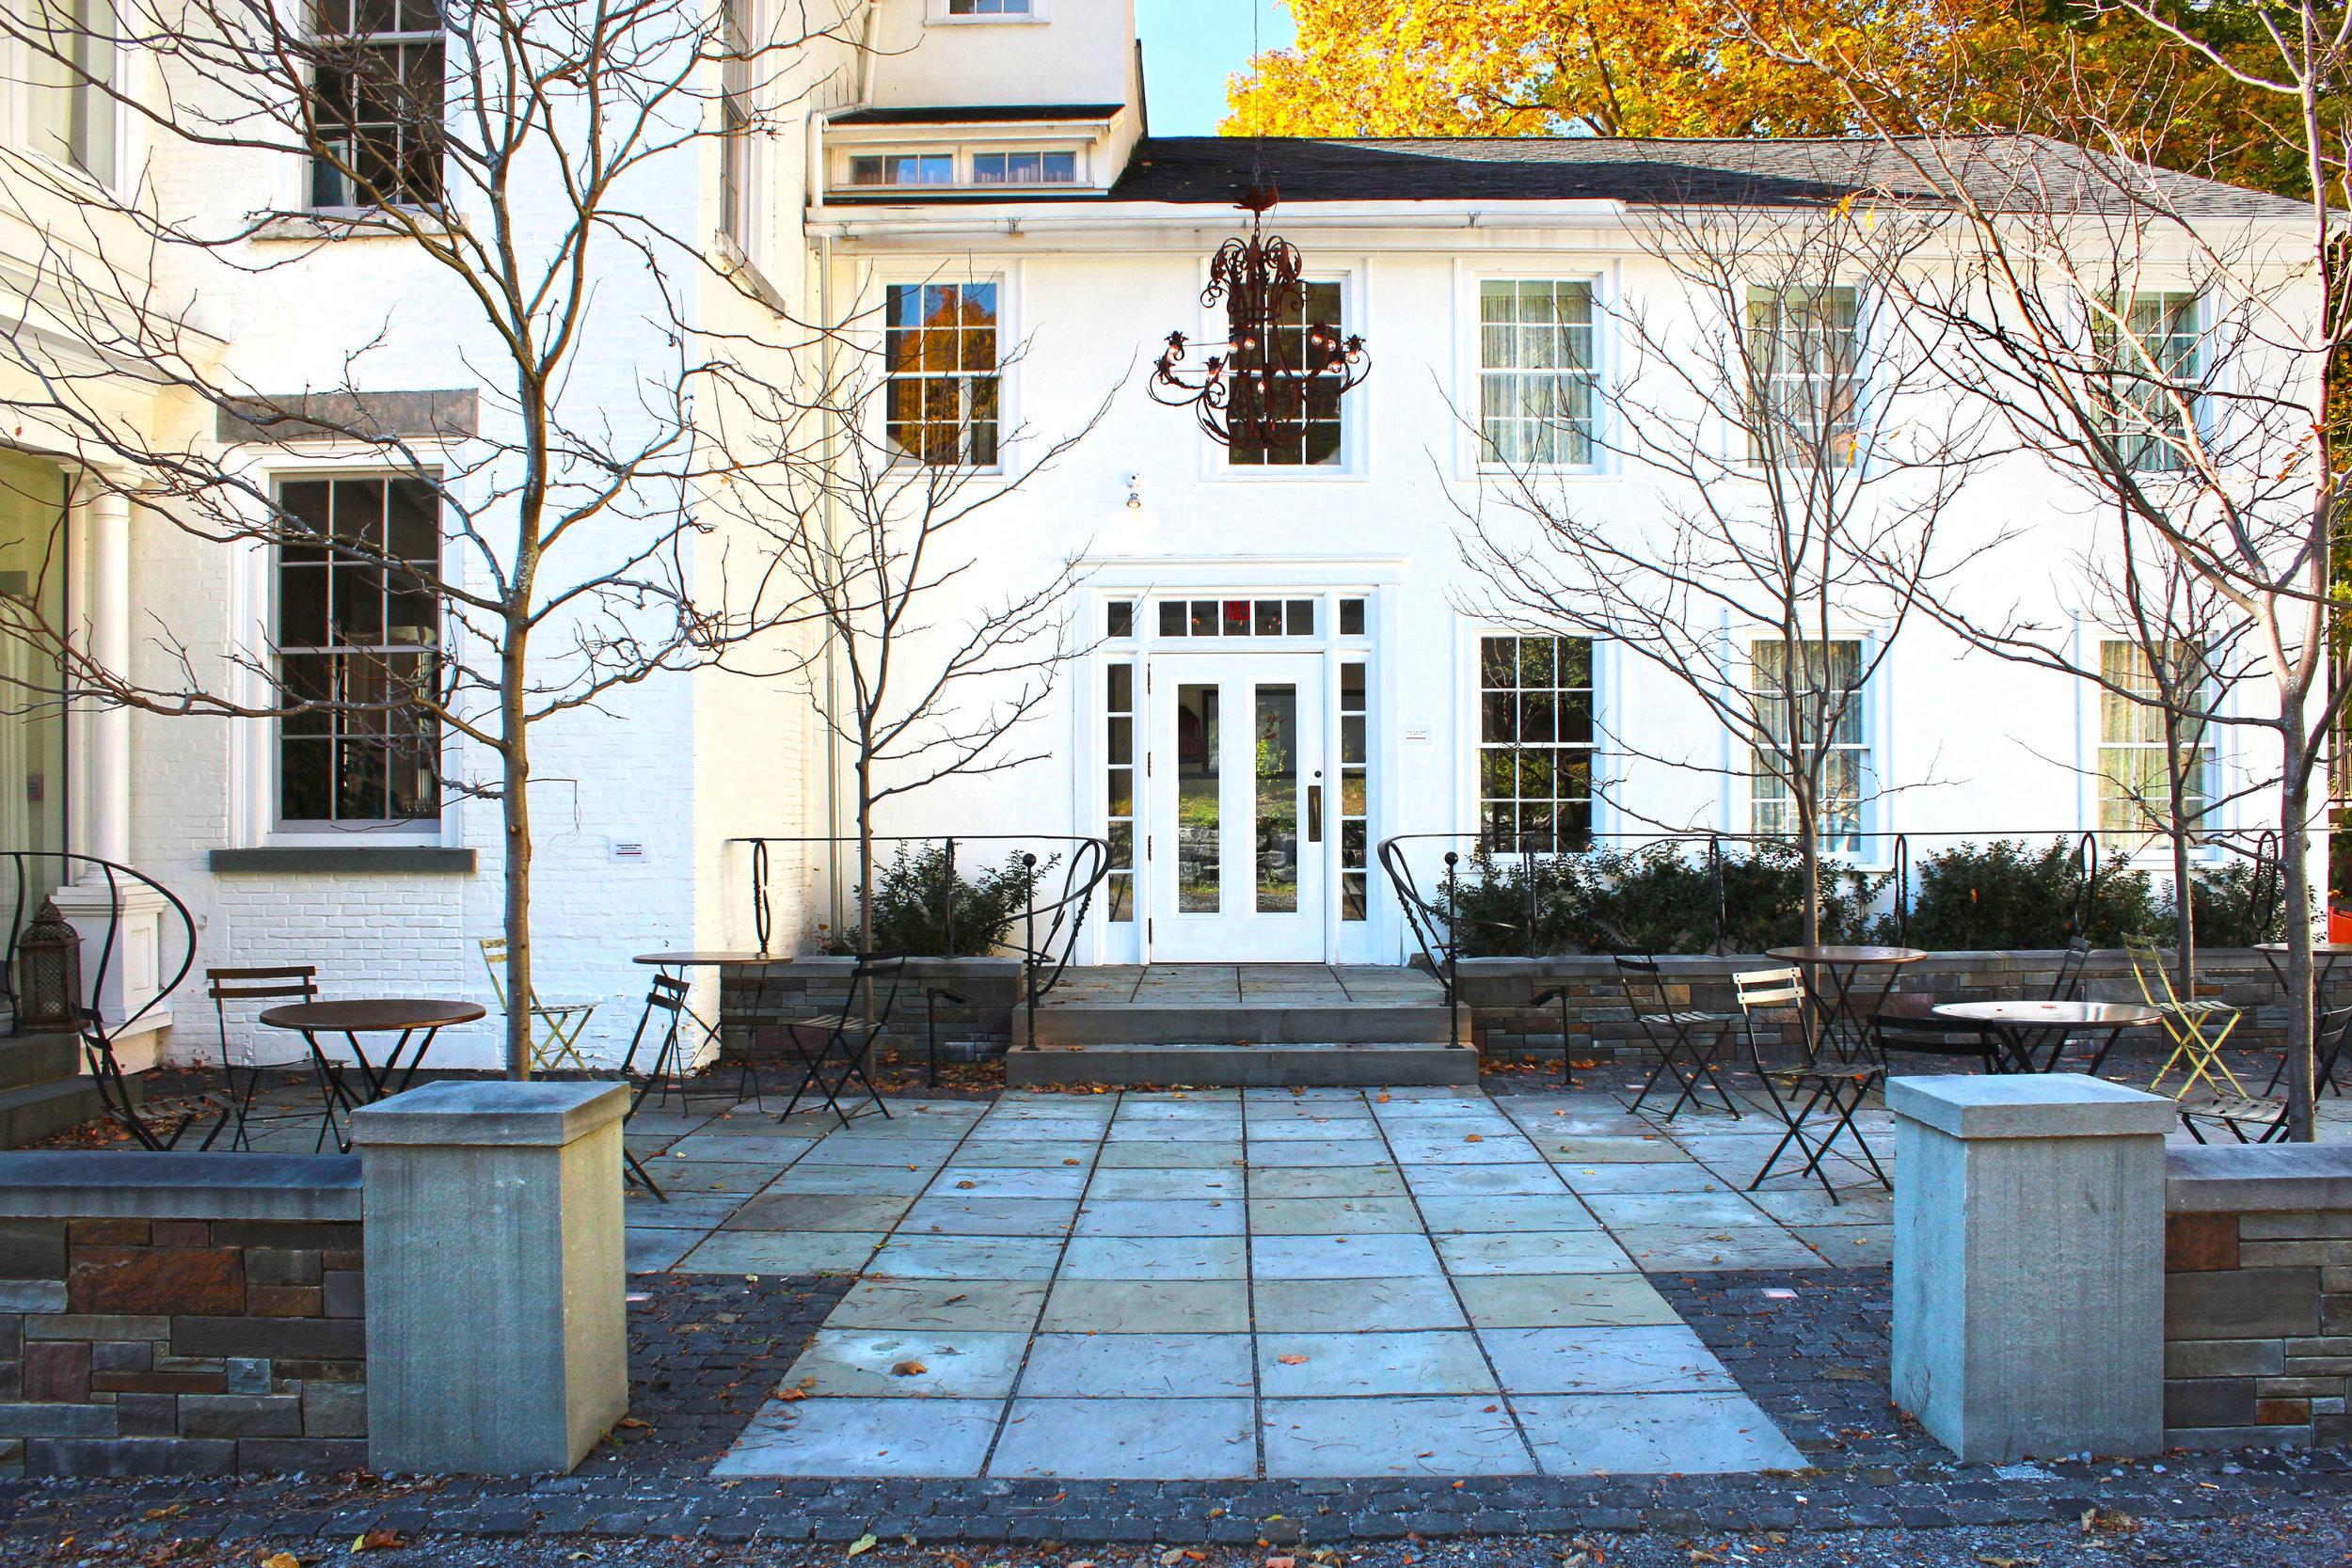 Argos-patio-entrance-stonework-ithaca-ny-whitham.jpg